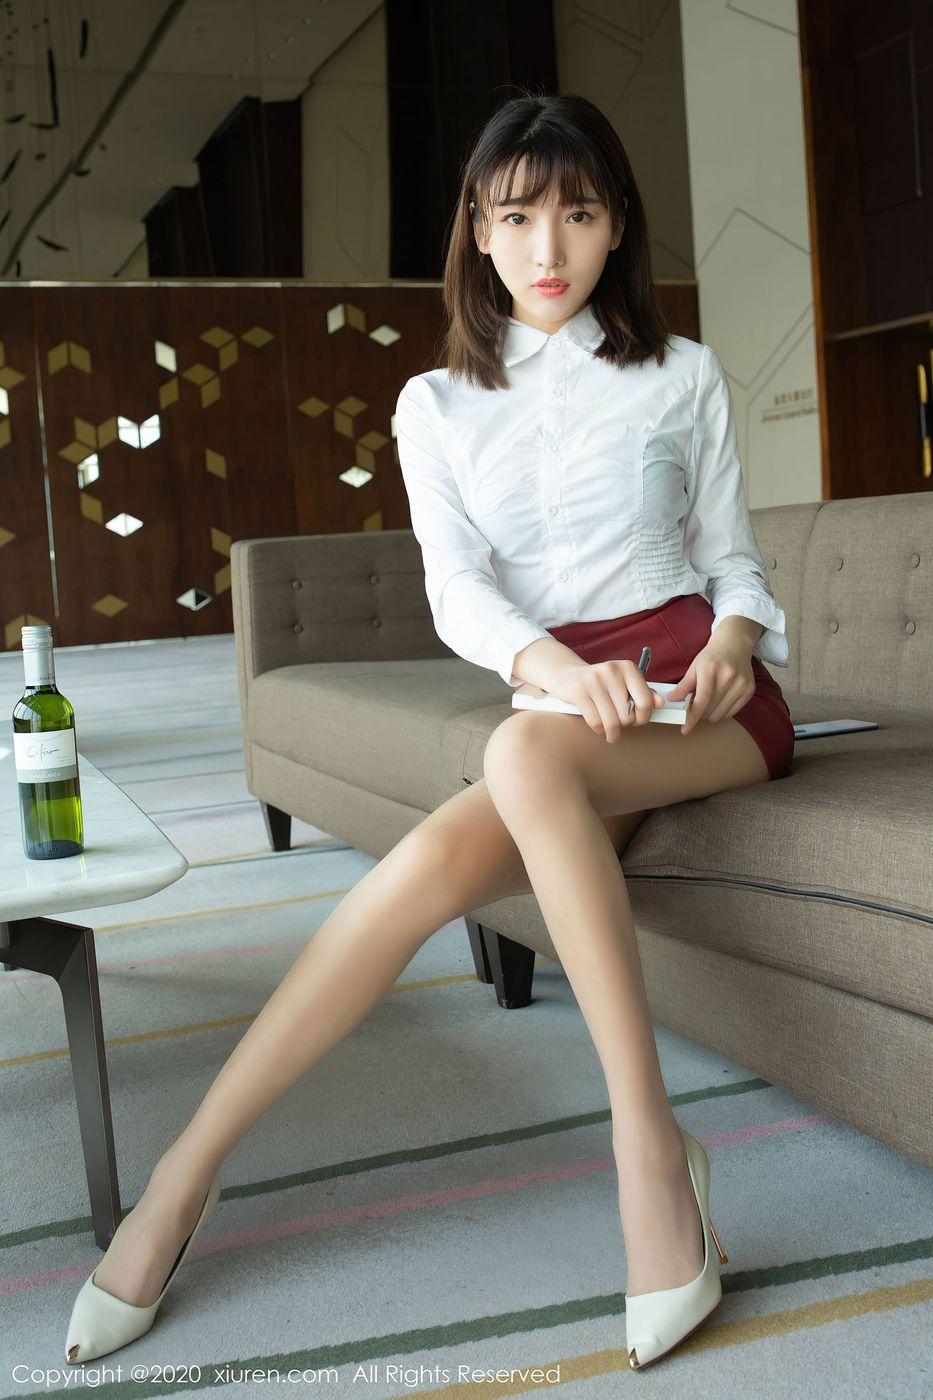 Vol.601 丝袜美腿内衣诱惑短发美女翘臀美女模特秀人网-陆萱萱完整私房照合集